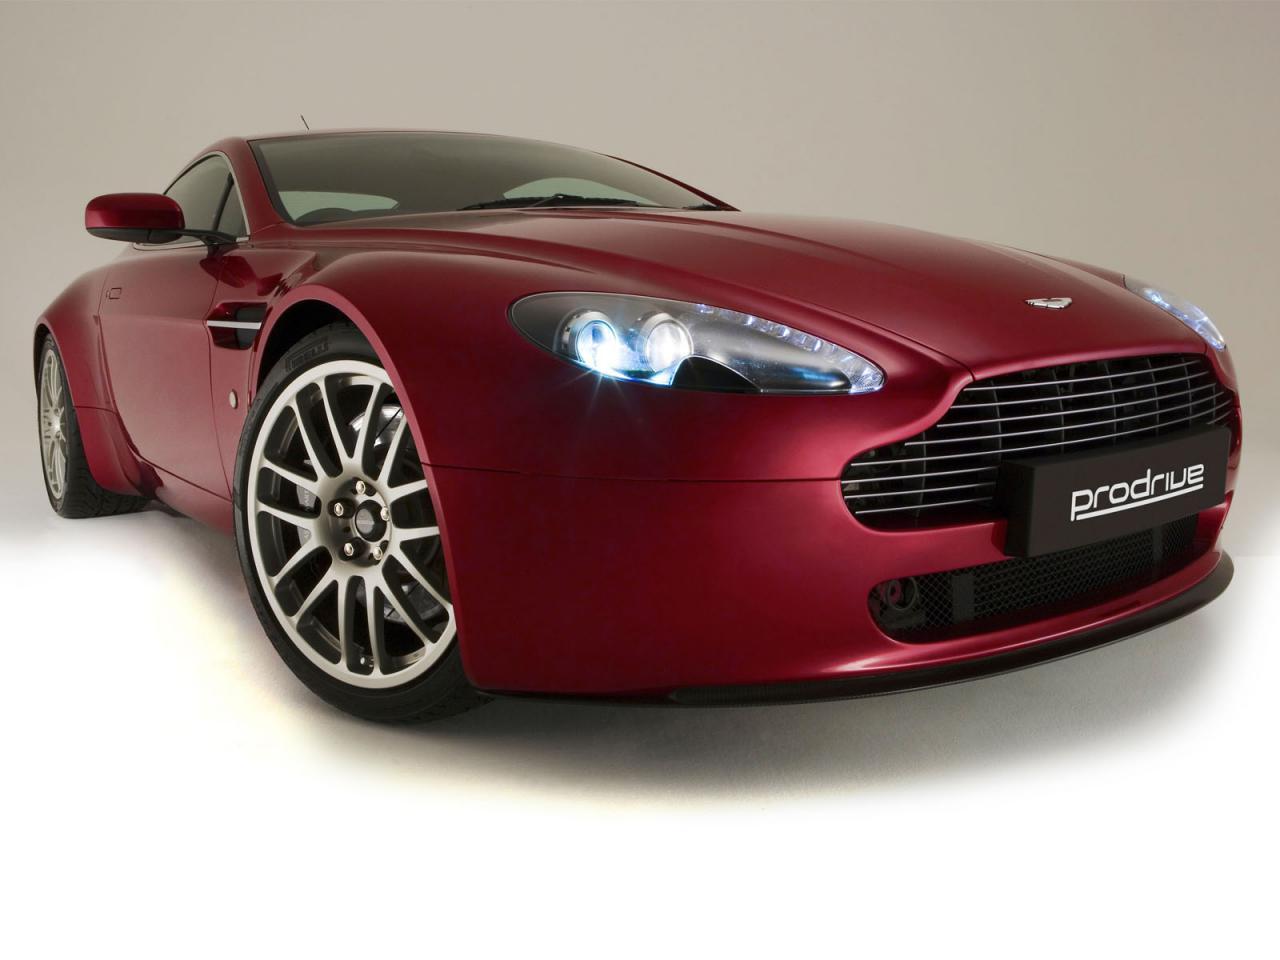 Aston Martin Vantage Prodrive